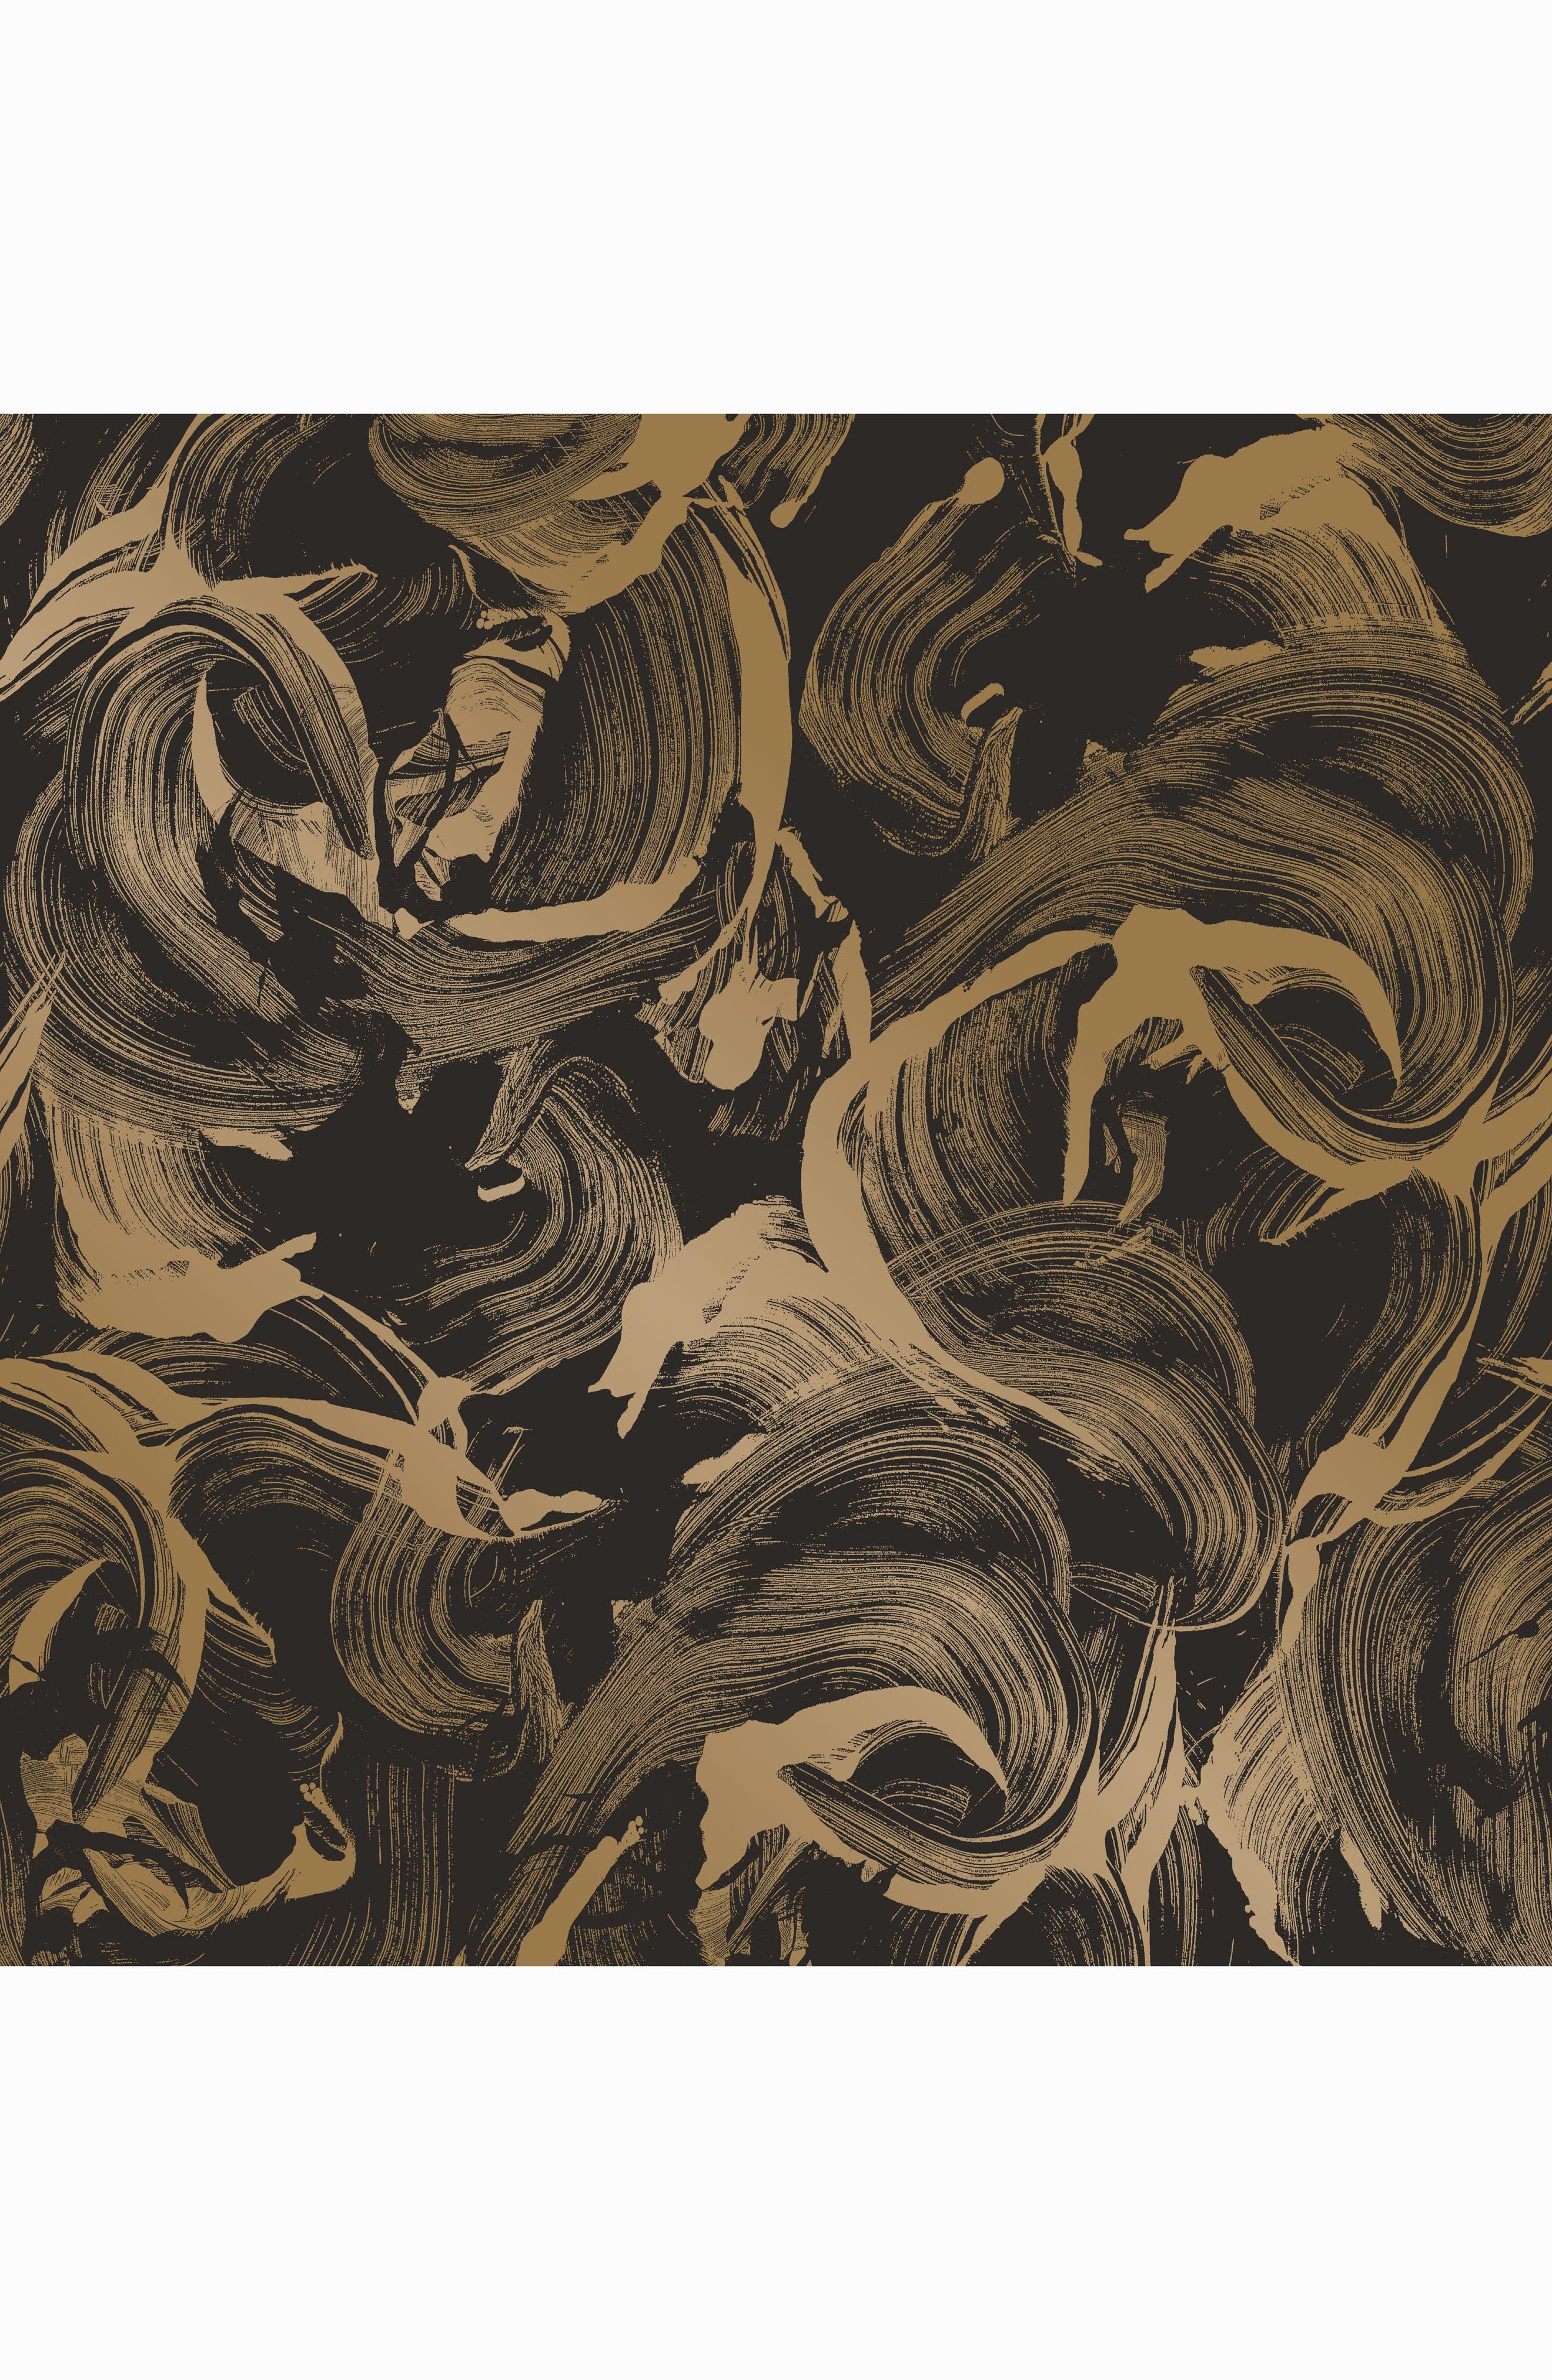 L'Amour Self-Adhesive Vinyl Wallpaper,                             Main thumbnail 1, color,                             Black/ Gold